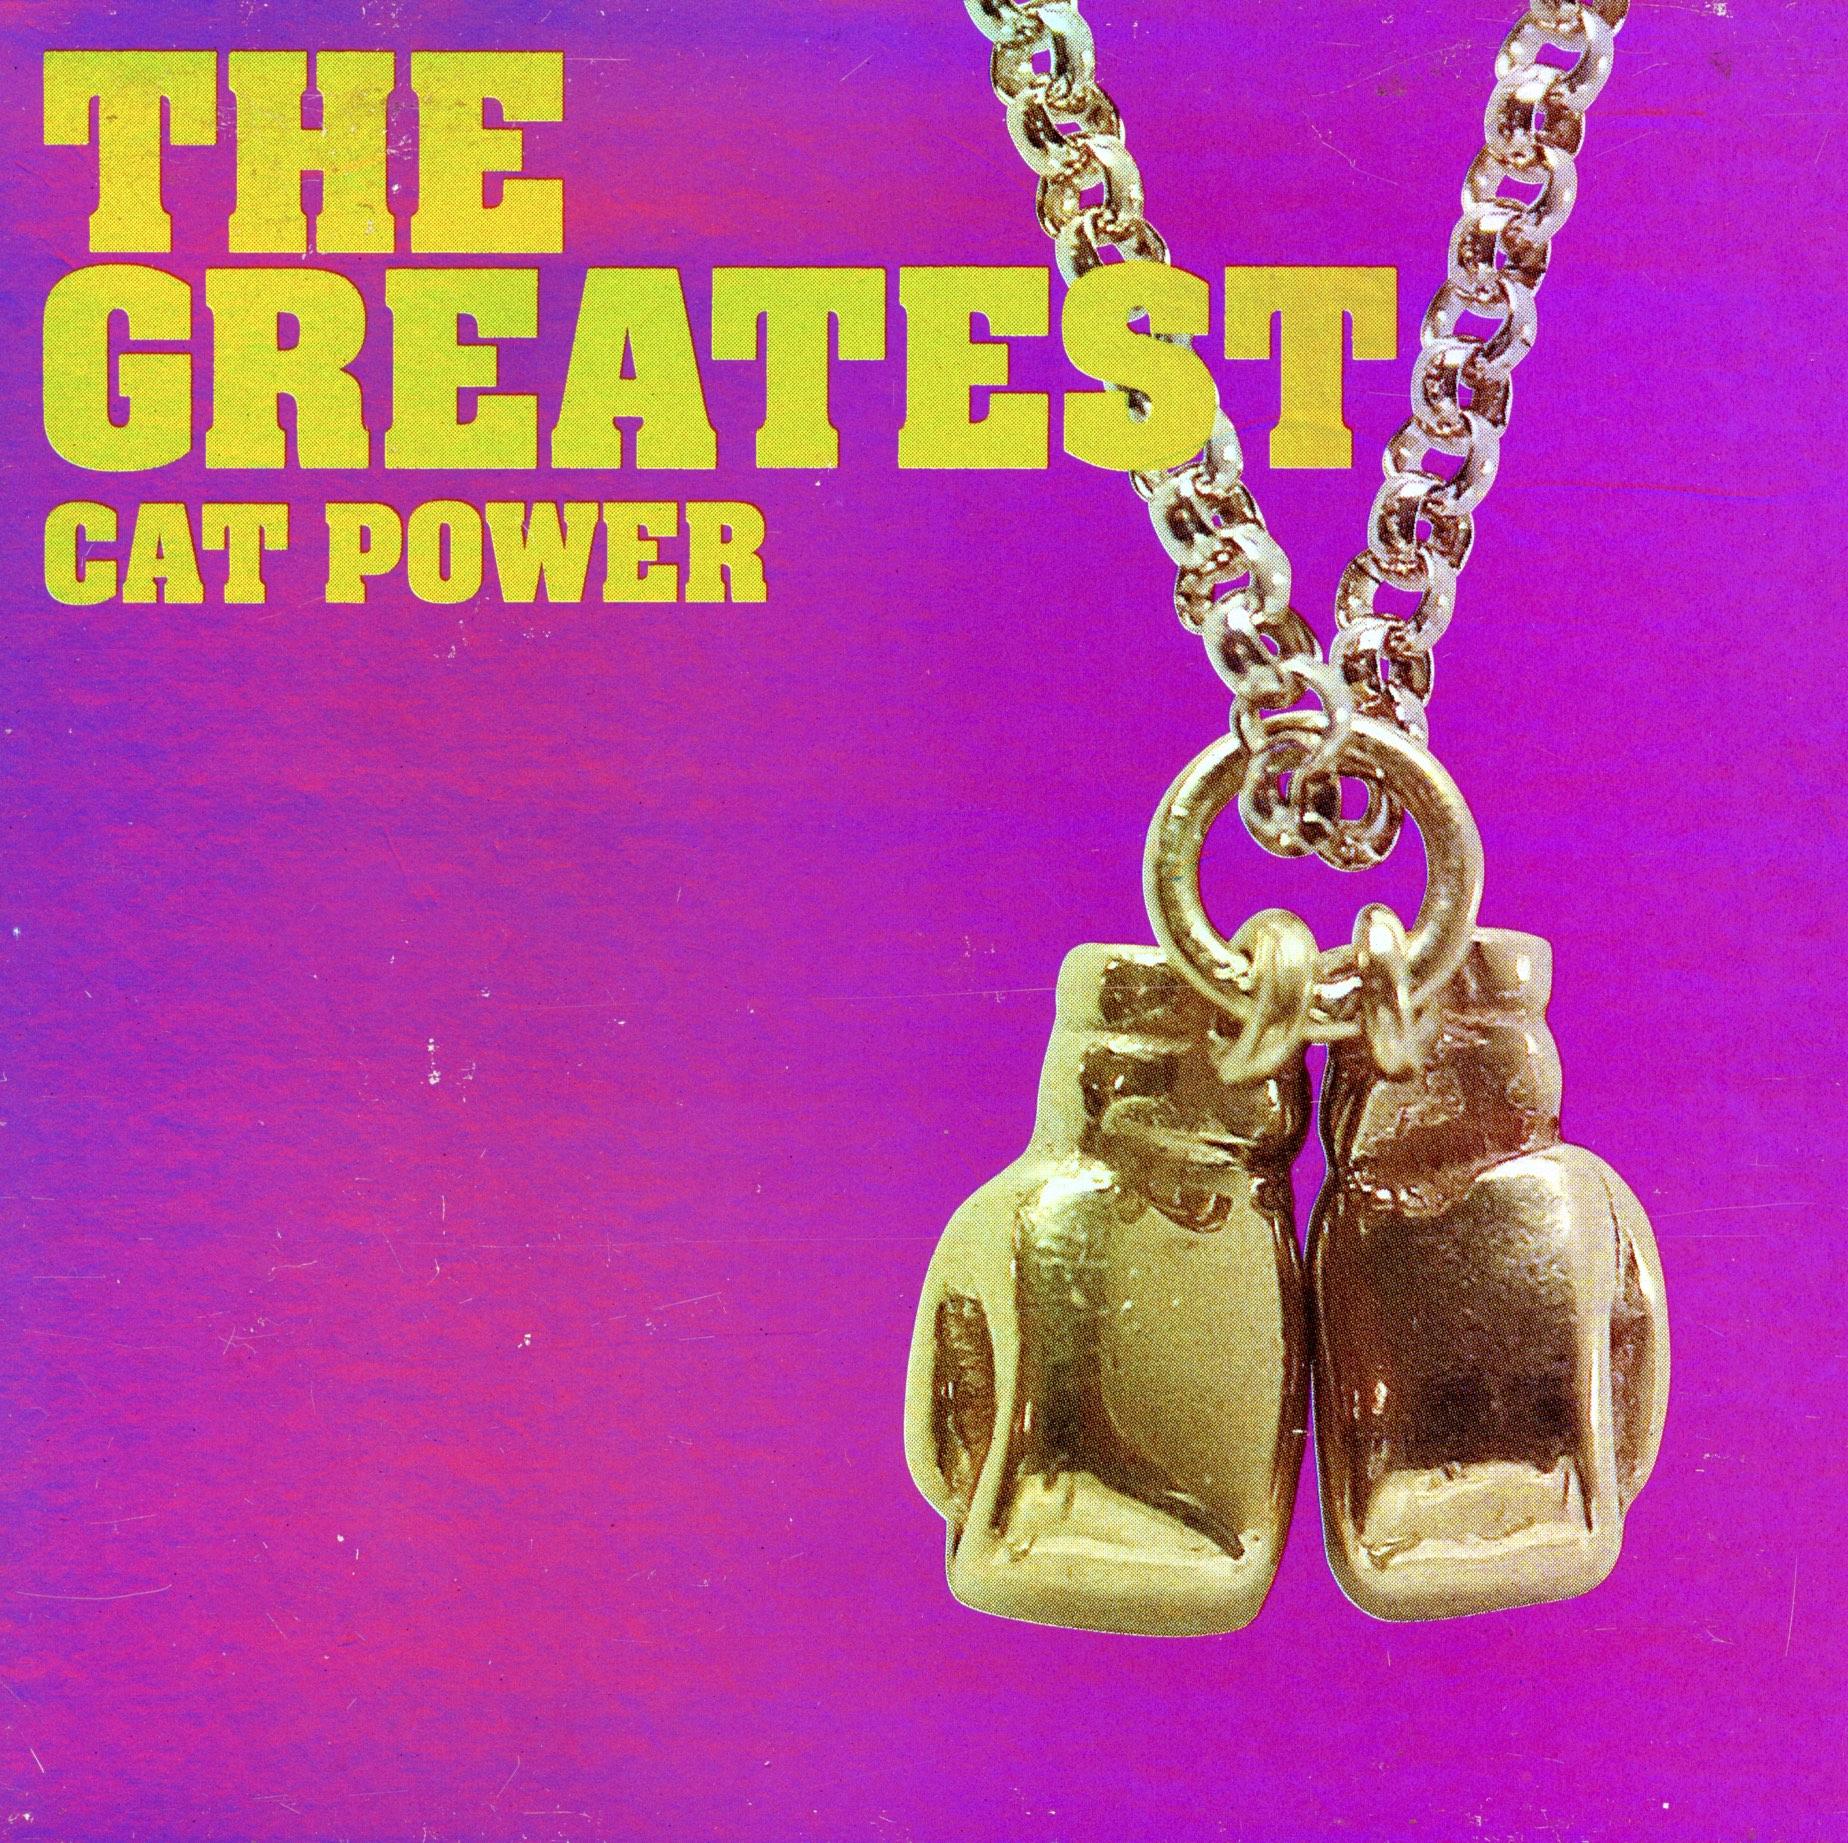 2006 - Cat Power